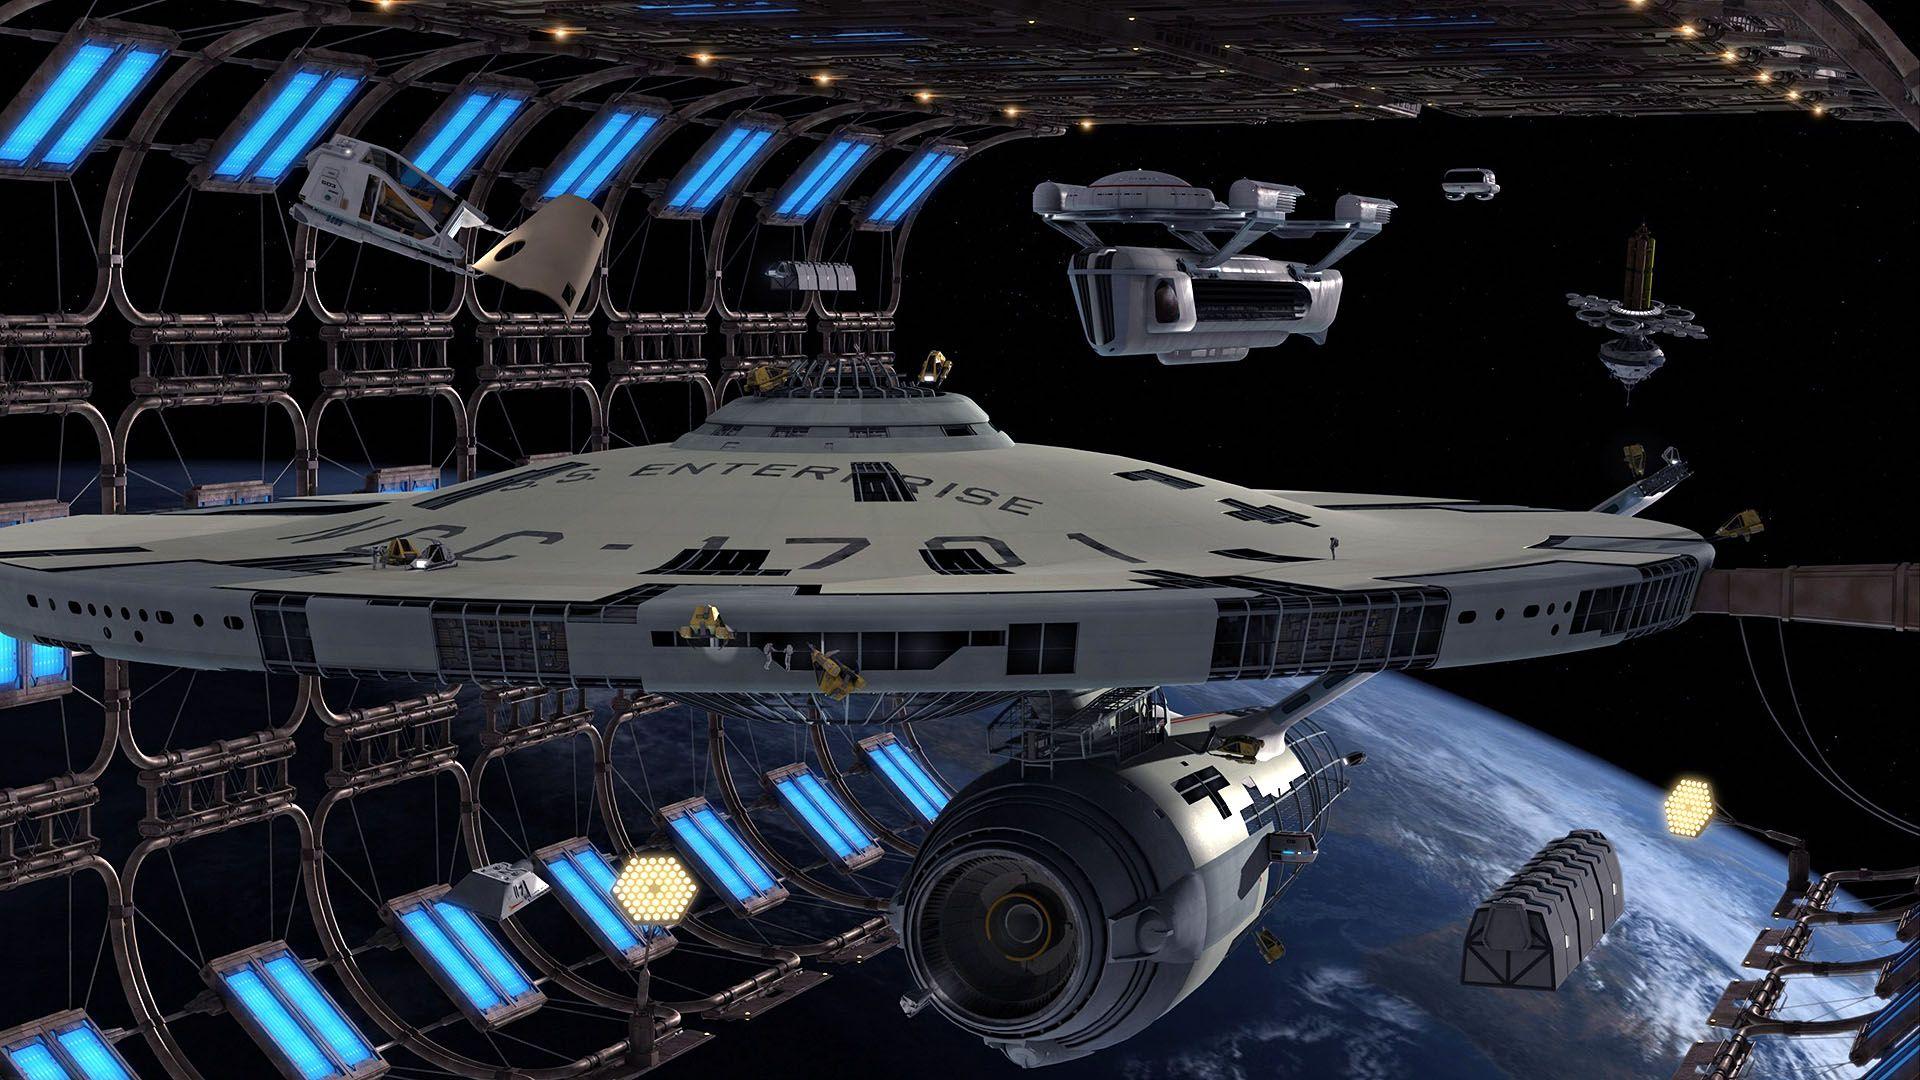 Warships 3d Art Star Trek Ships Vehicles Uss Enterprise Ship Refit Hd Wallpaper Of Star Trek Wallpaper Star Trek Ships Star Trek